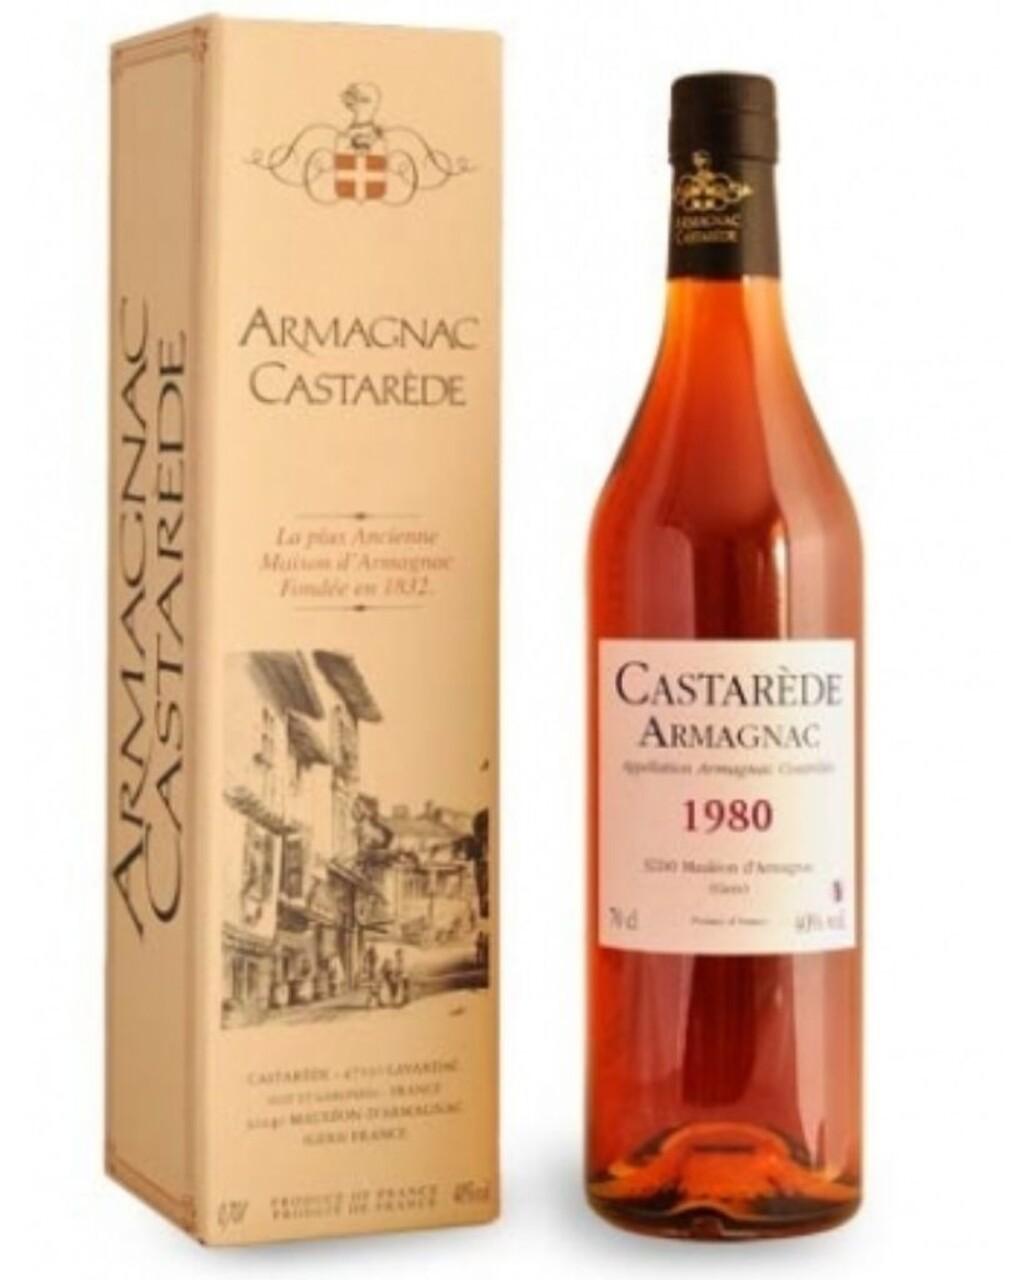 ARMAGNAC CASTAREDE 1980